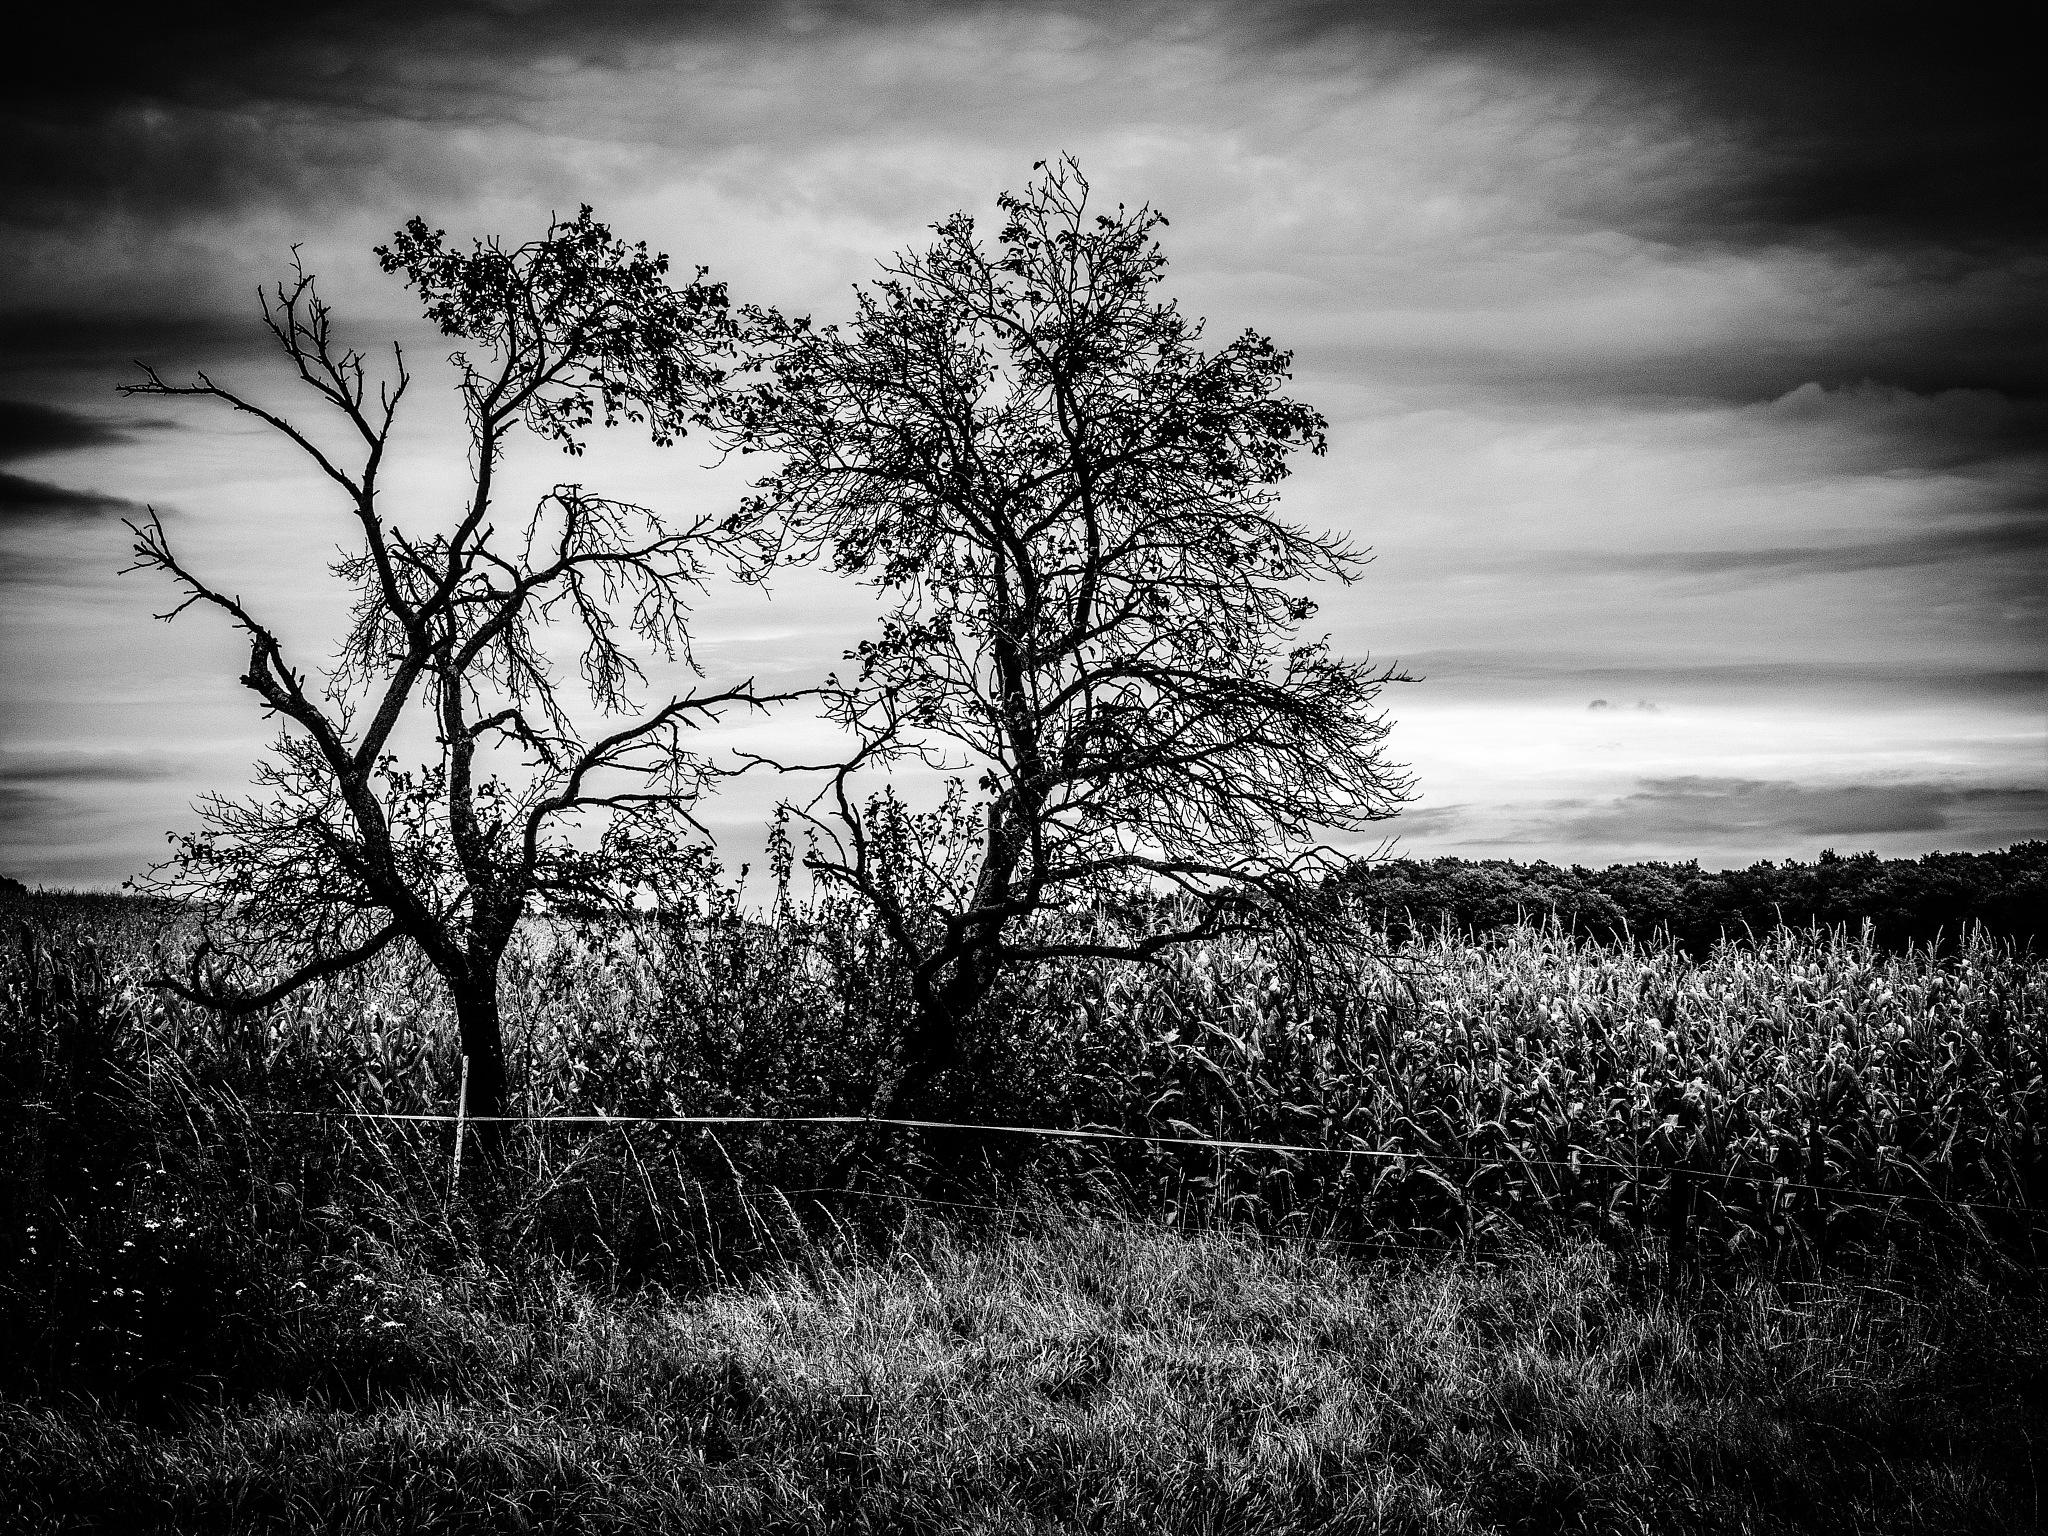 Landscape in bw by Brigitte Bohlscheid